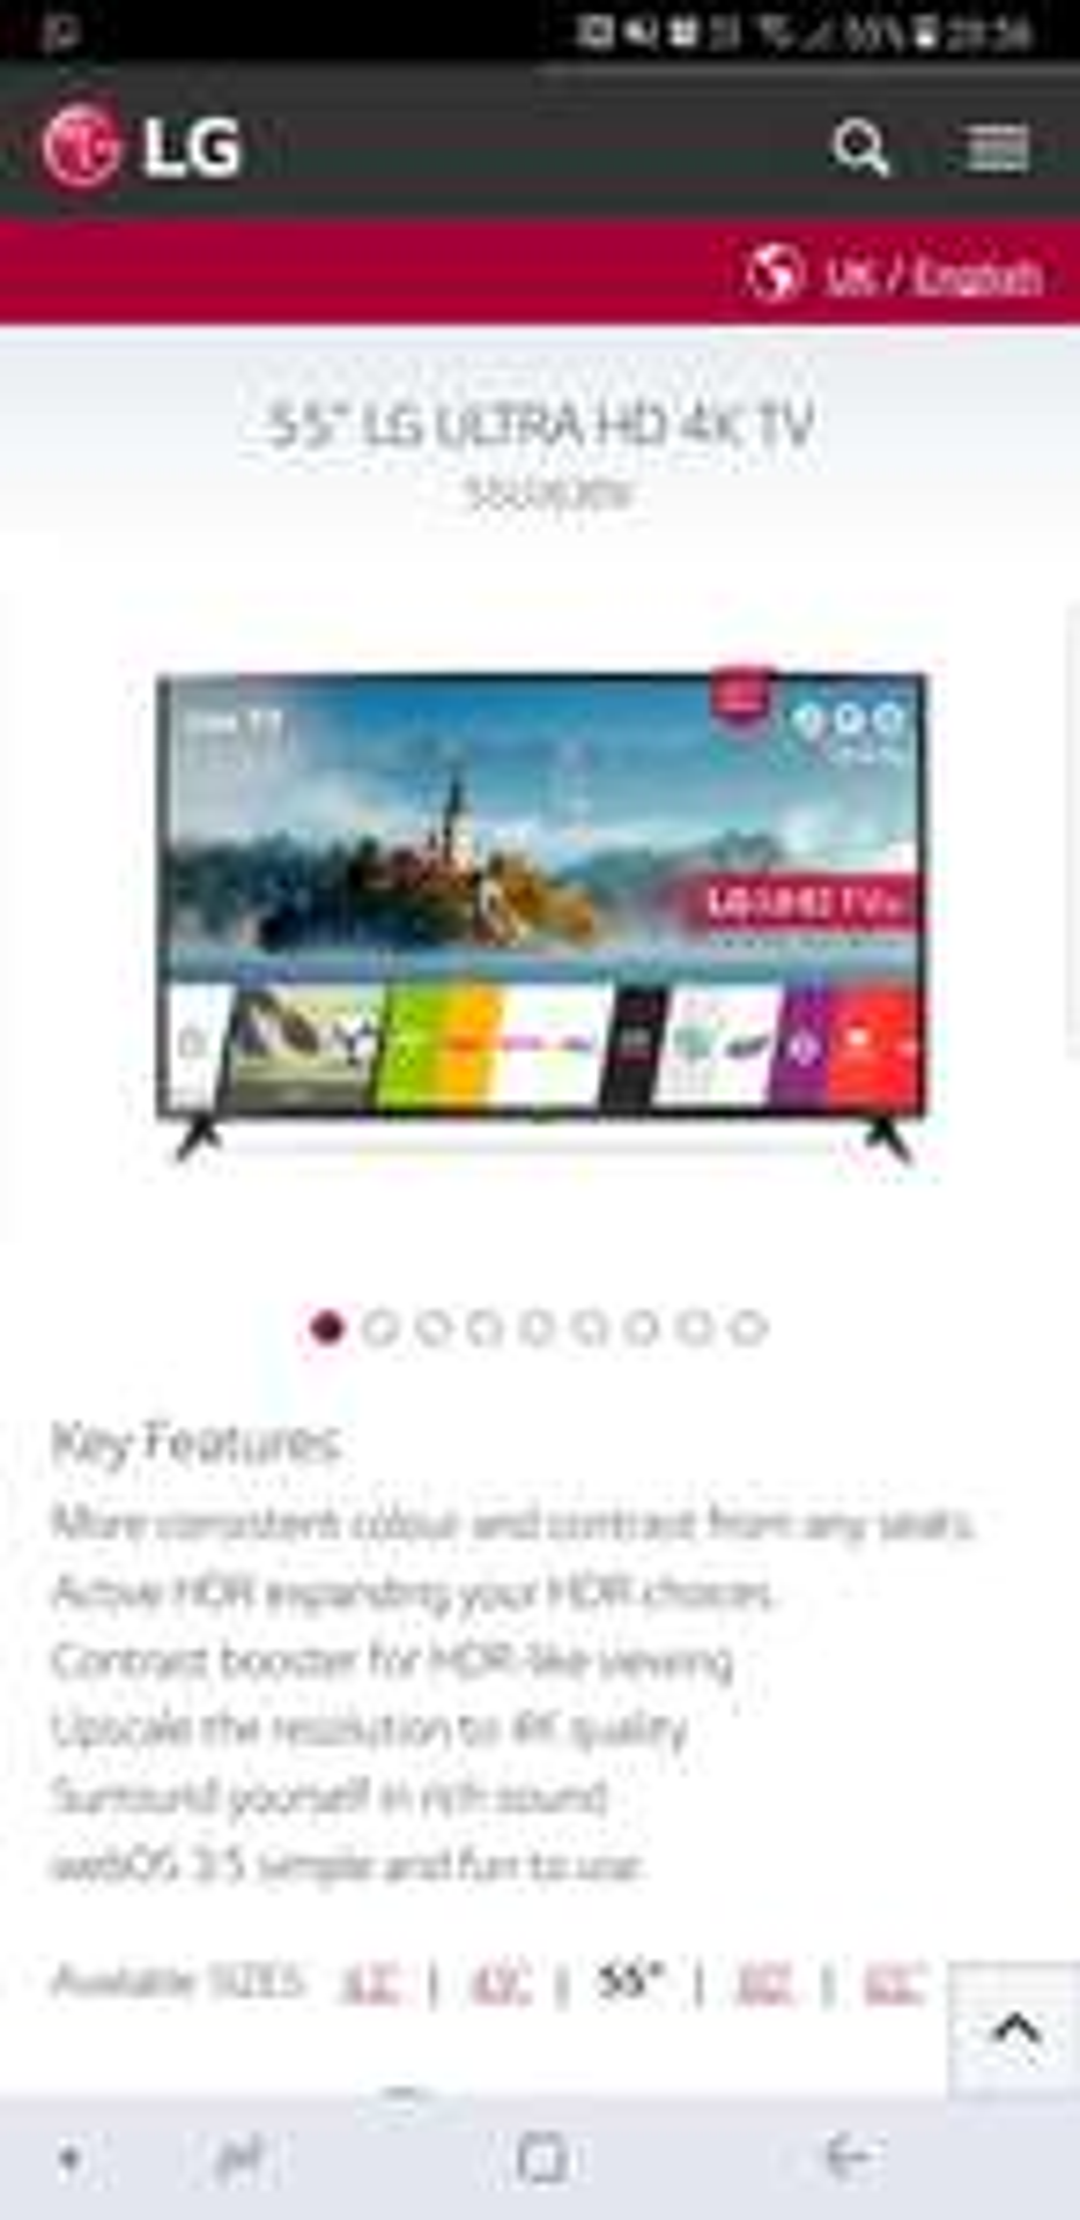 LG 55UJ630V 55 Inch,4K Ultra HD HDR, Freeview Play, Smart, LED TV £529.99 @ Very